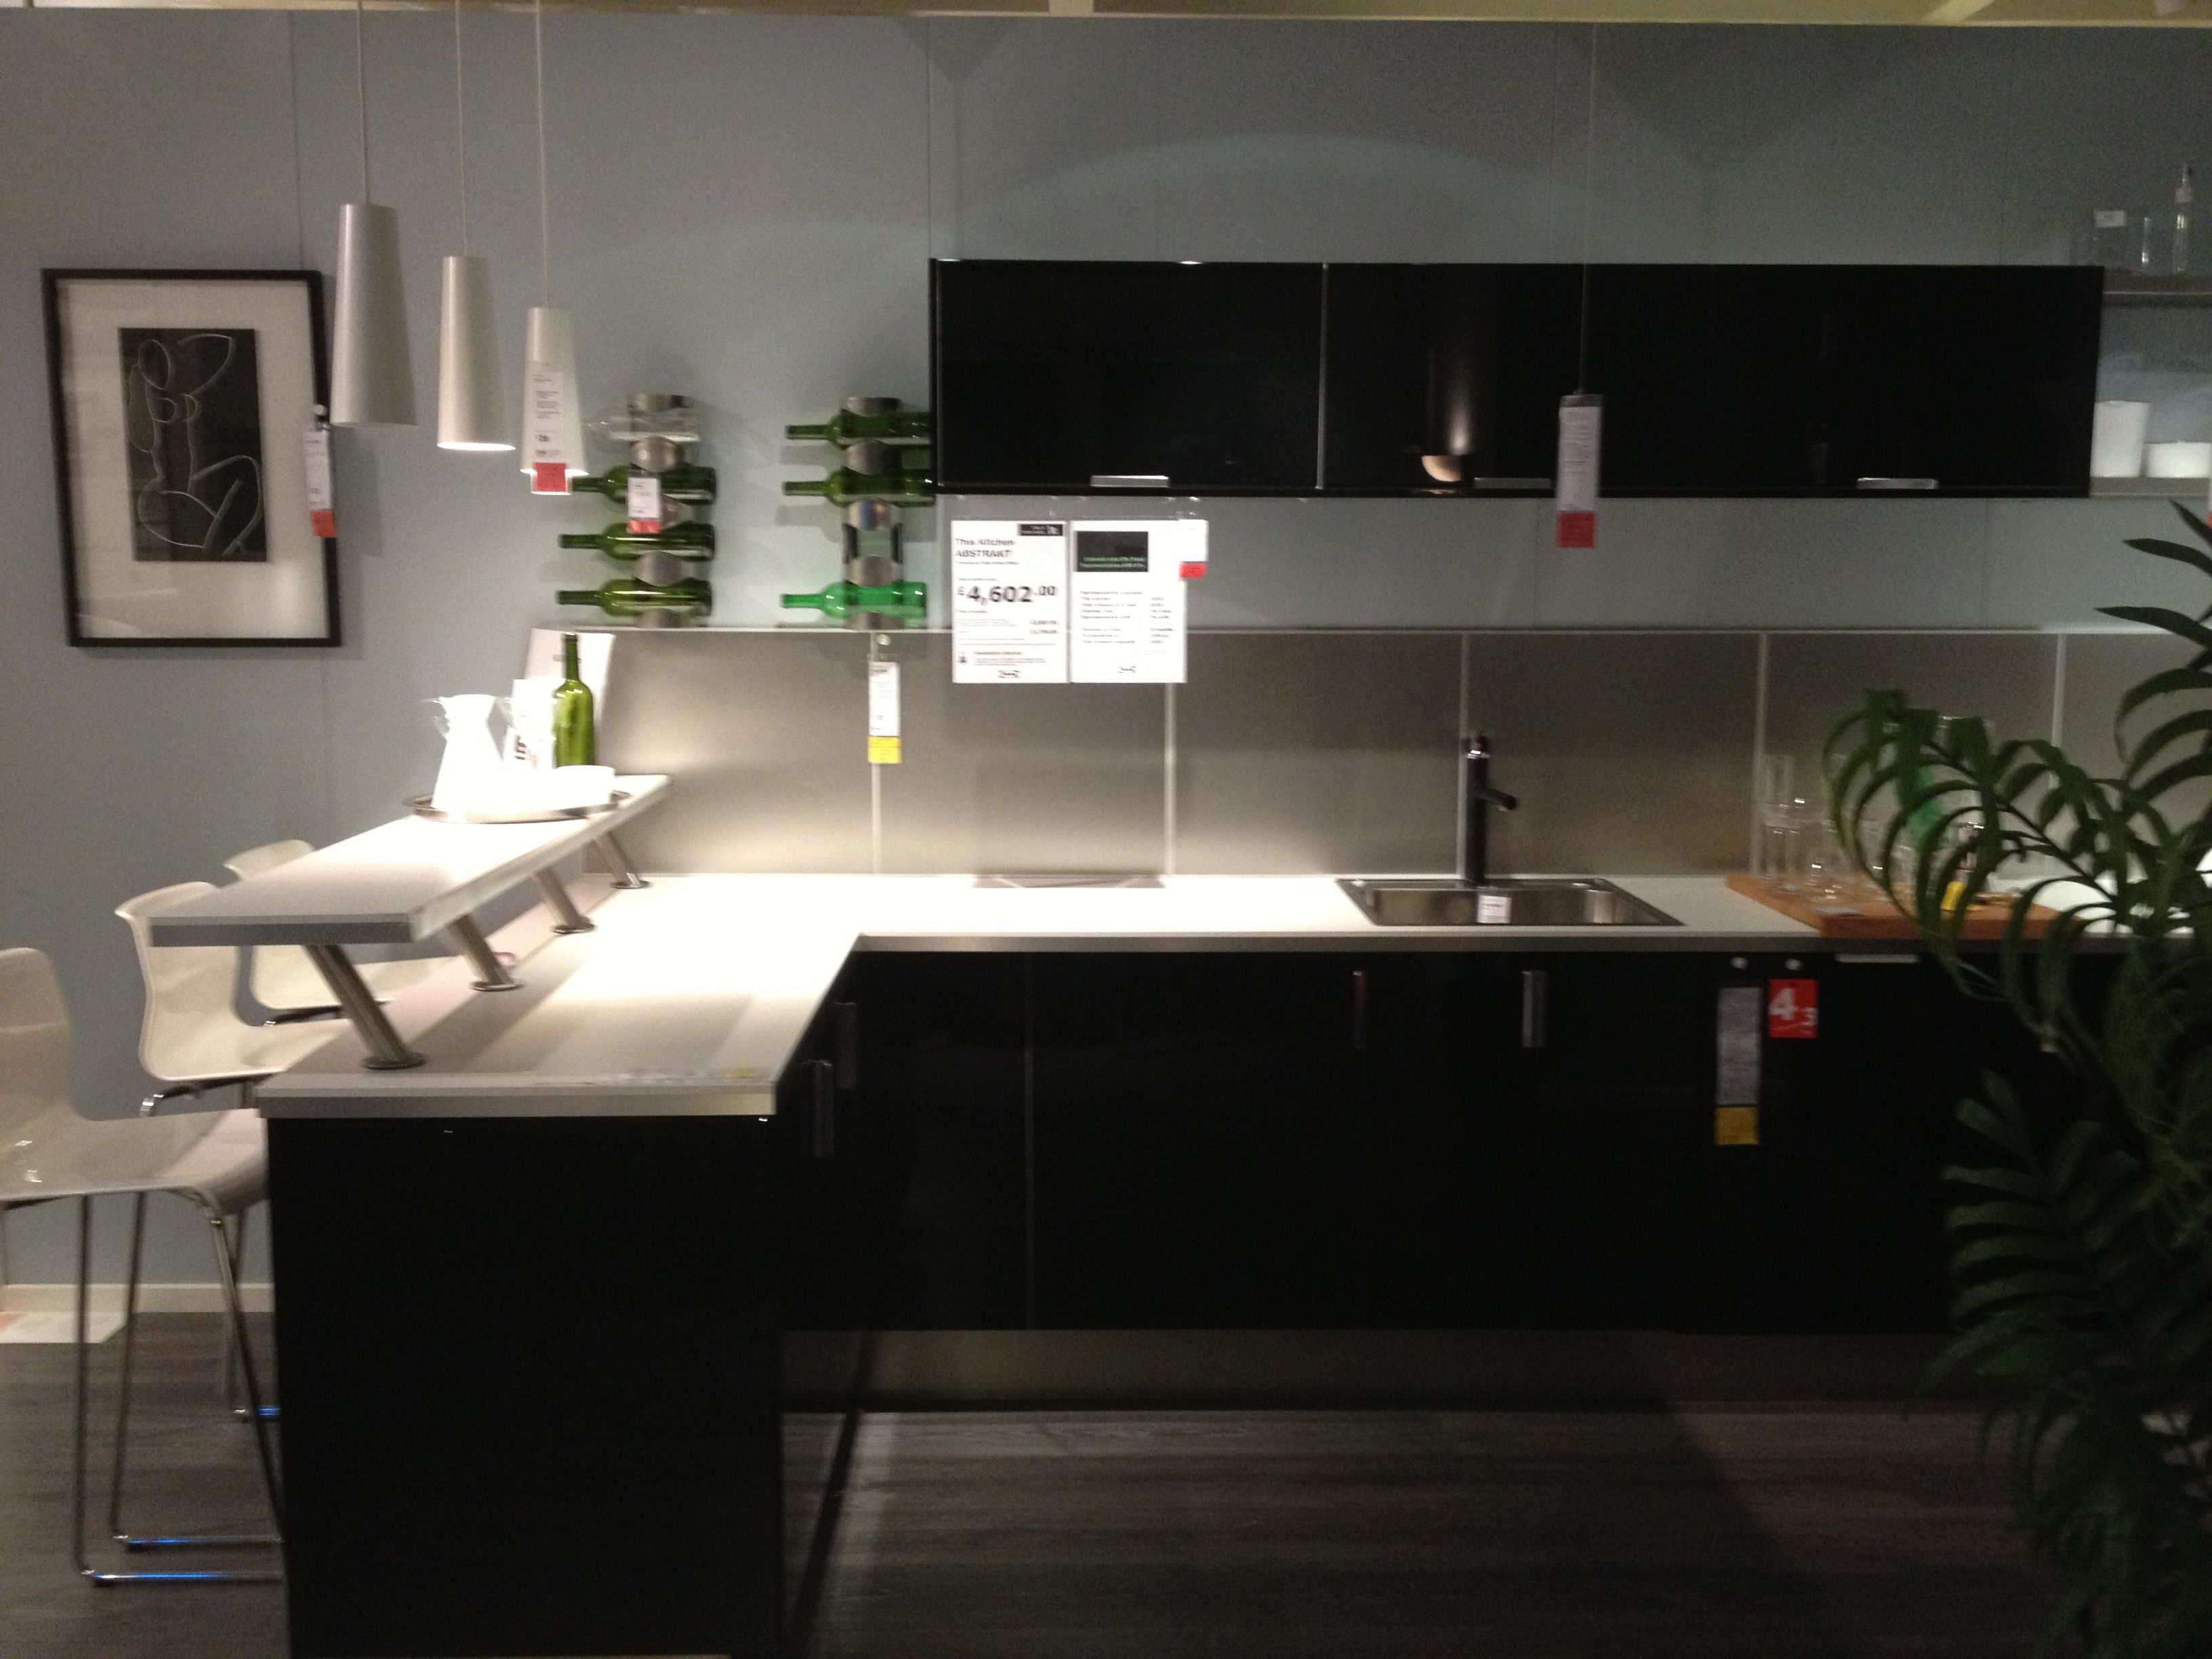 Ikea Kitchen Bar Built In Wine Rack Cabinets With Breakfast Basement